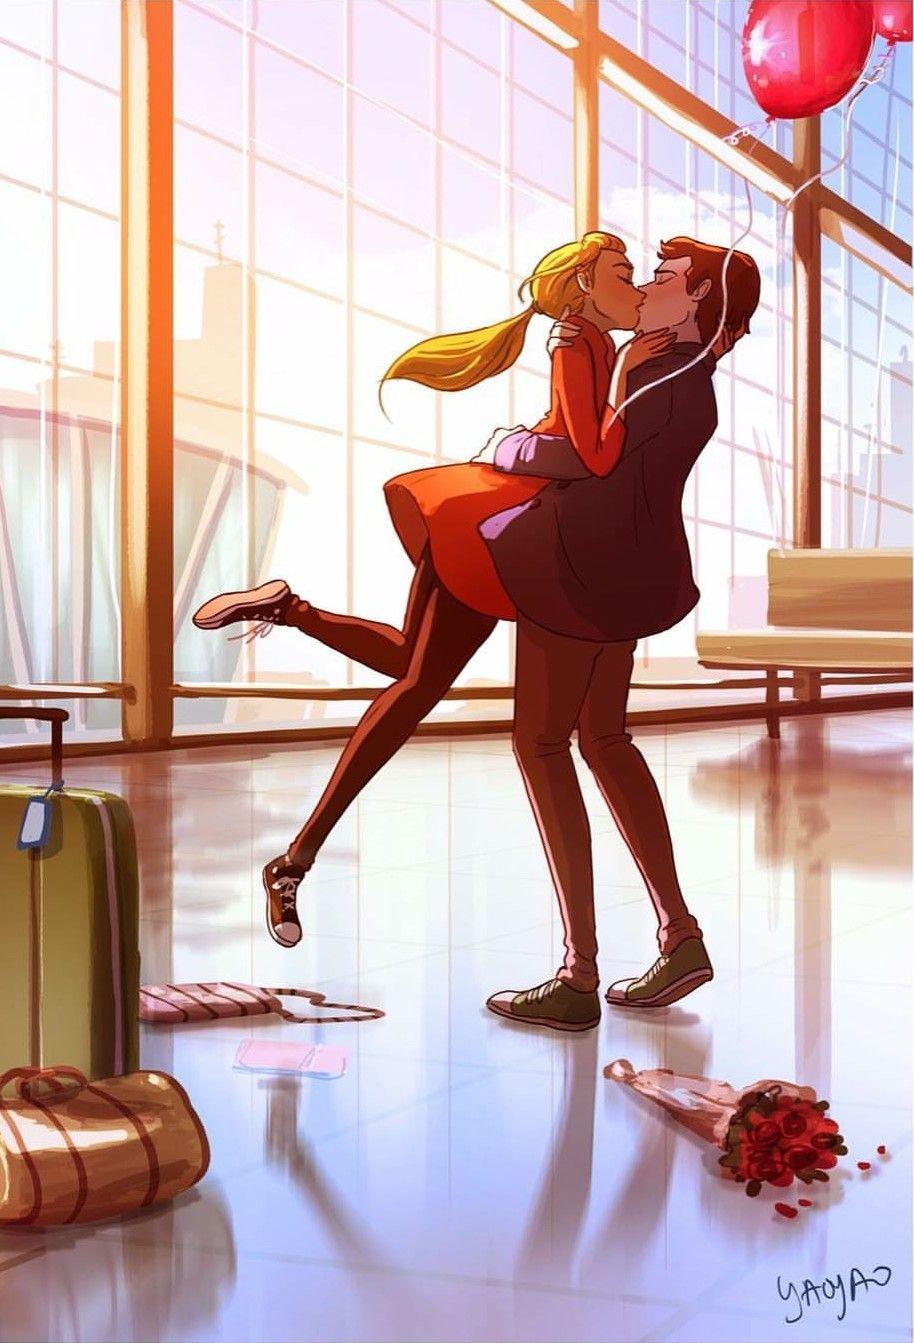 #illustration #couple #character #characterdesign #digitalart #cute #boyfriend #girlfriend